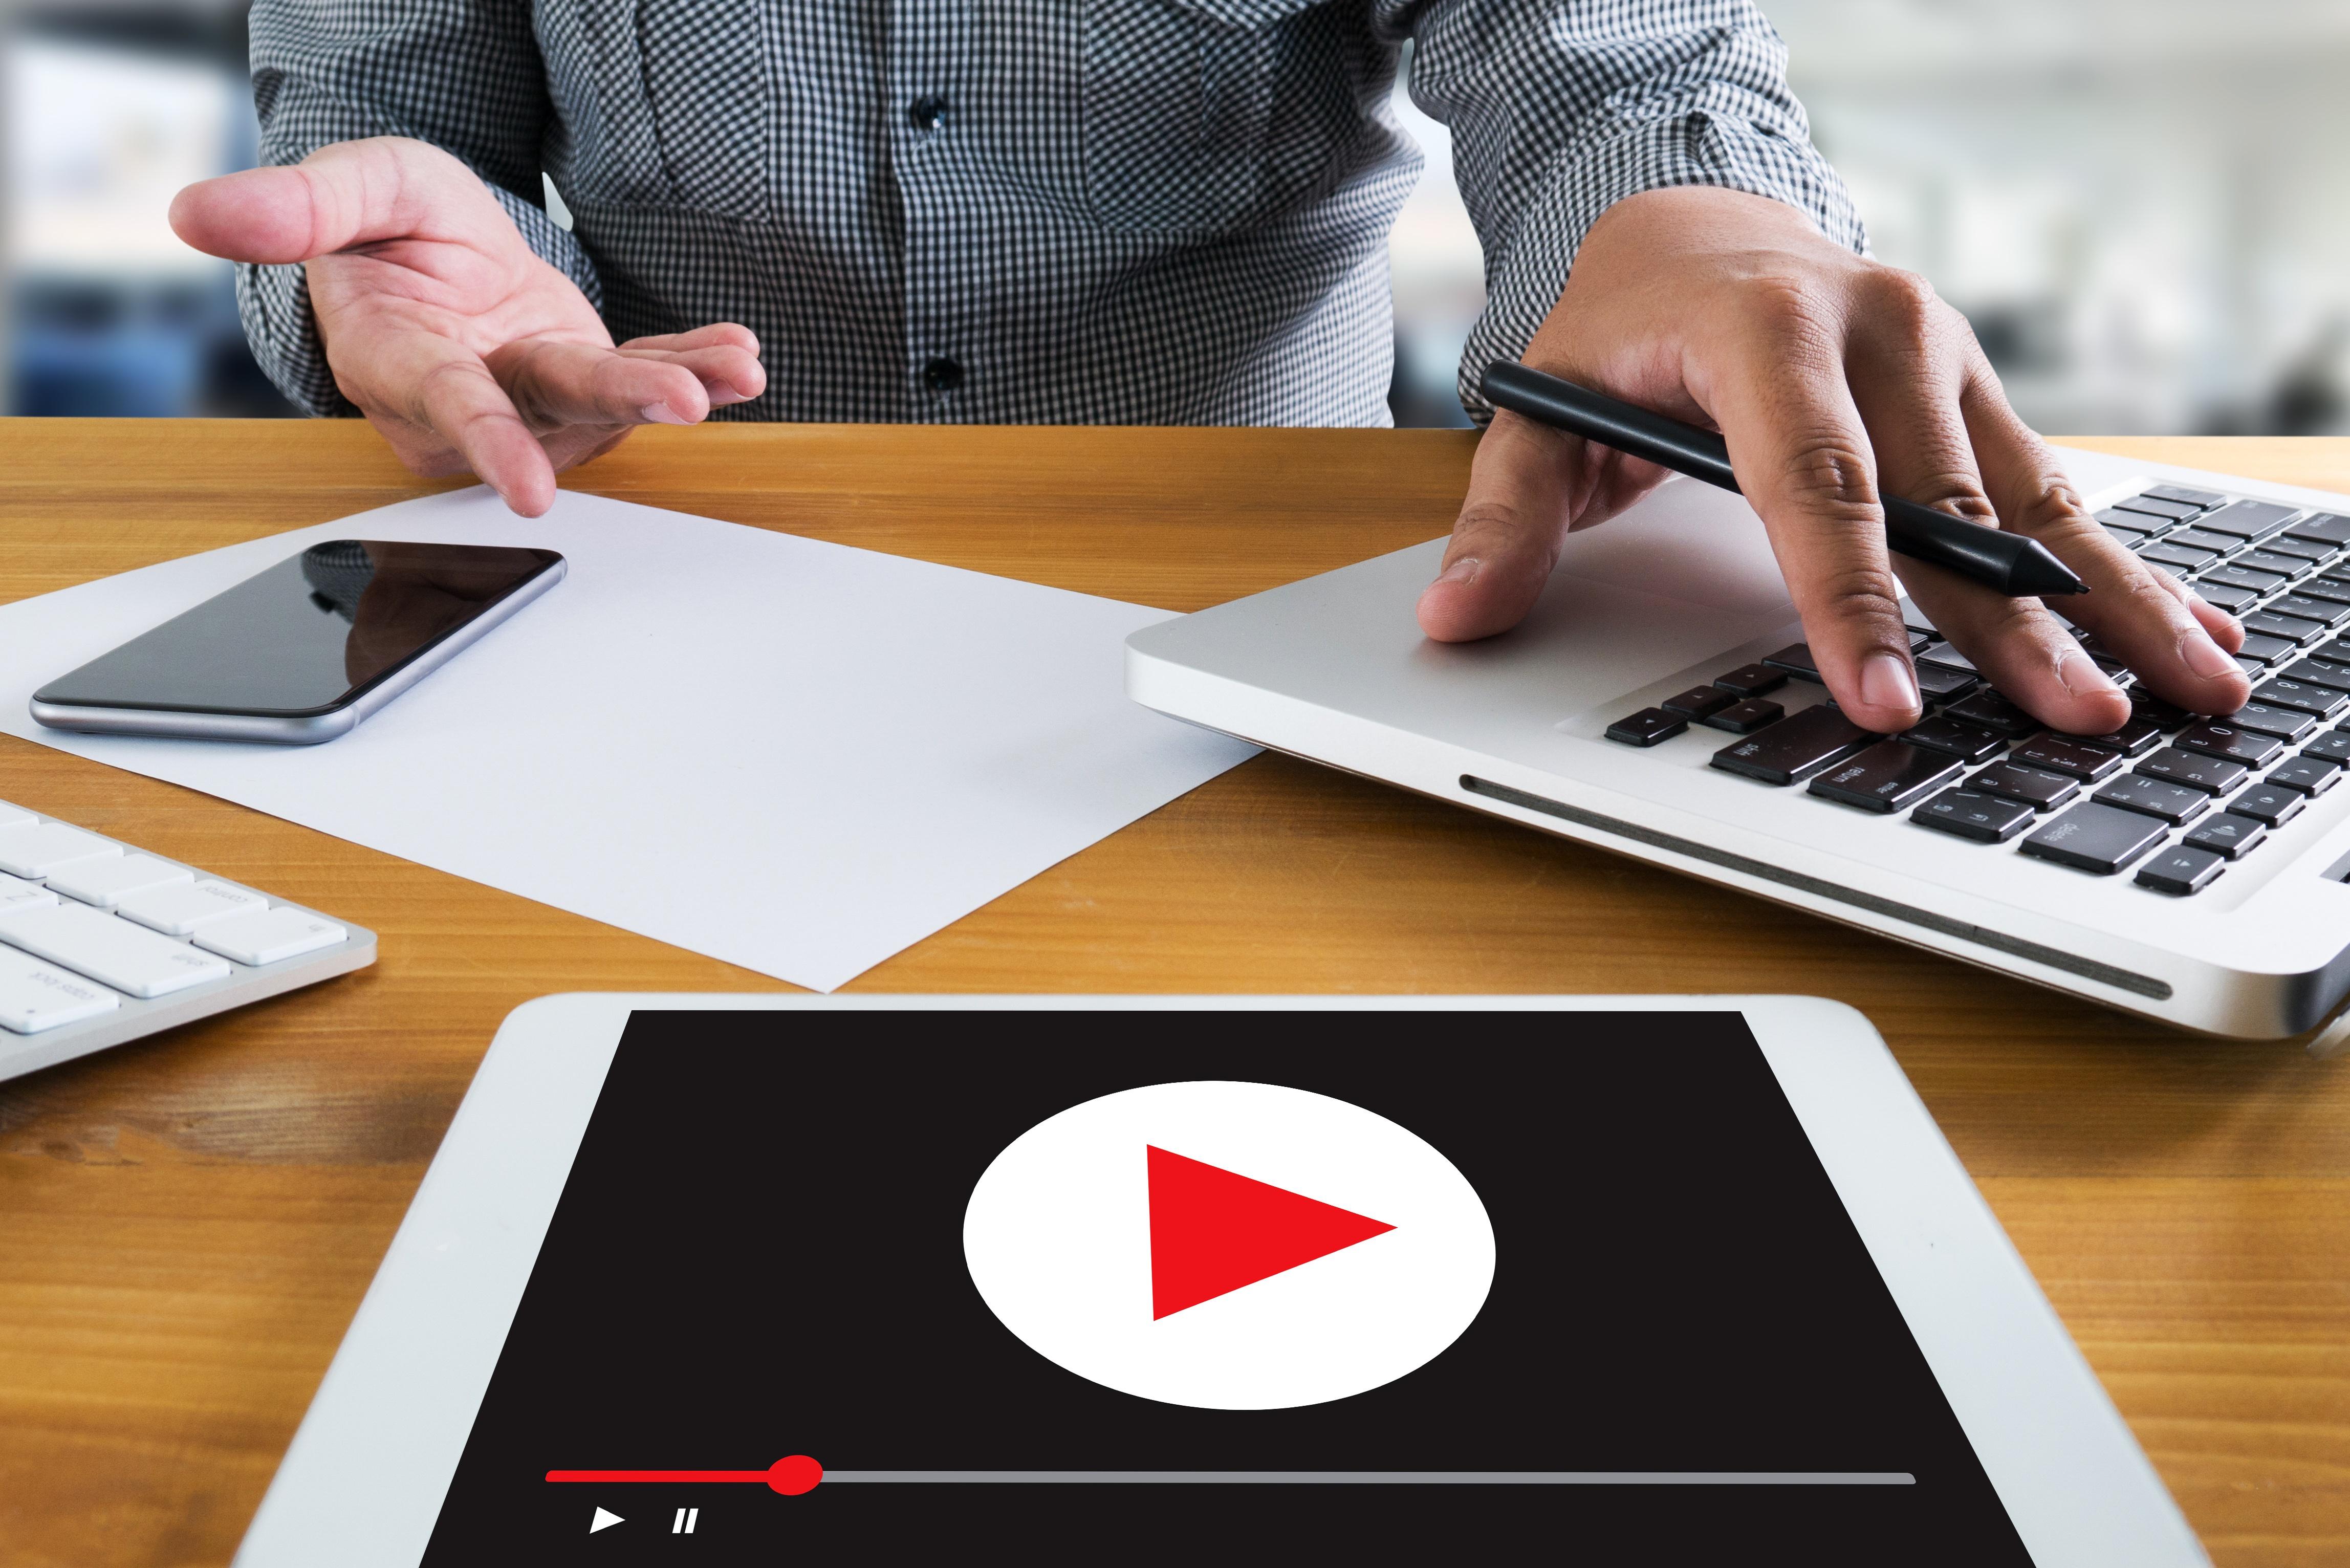 bigstock-Video-Marketing-Audio-Video---206603482